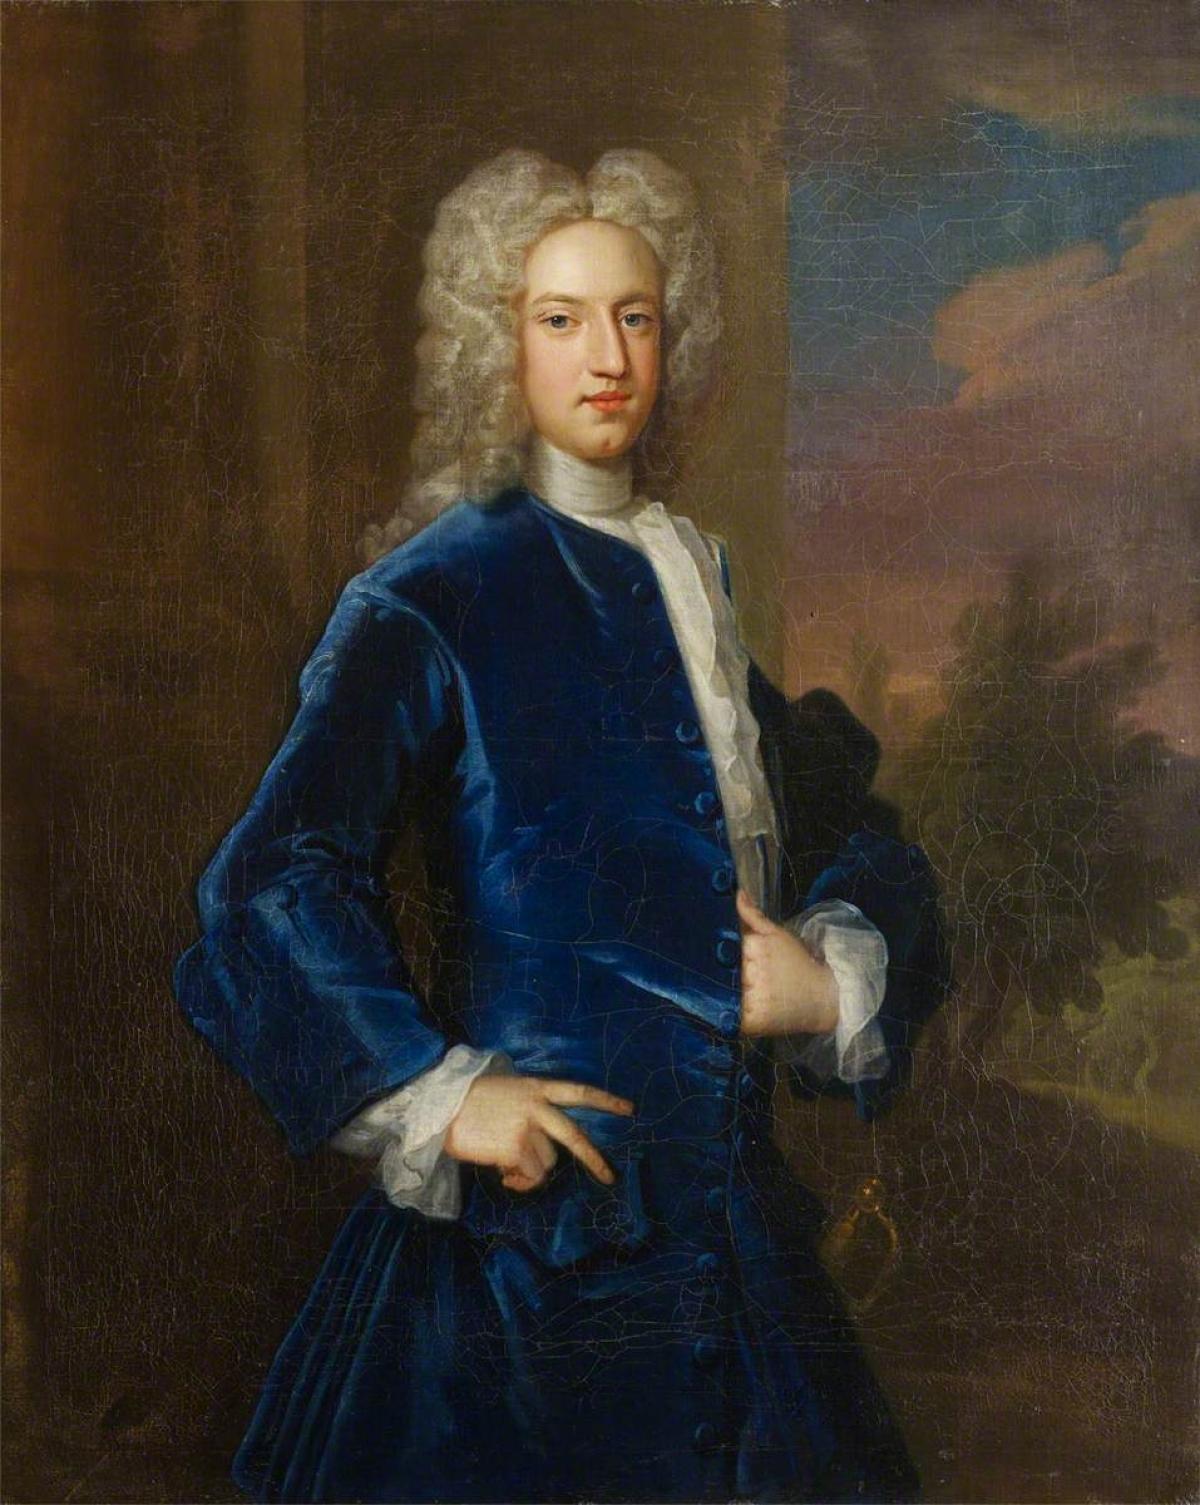 John Dryden, English poet, literary critic, translator, and playwright